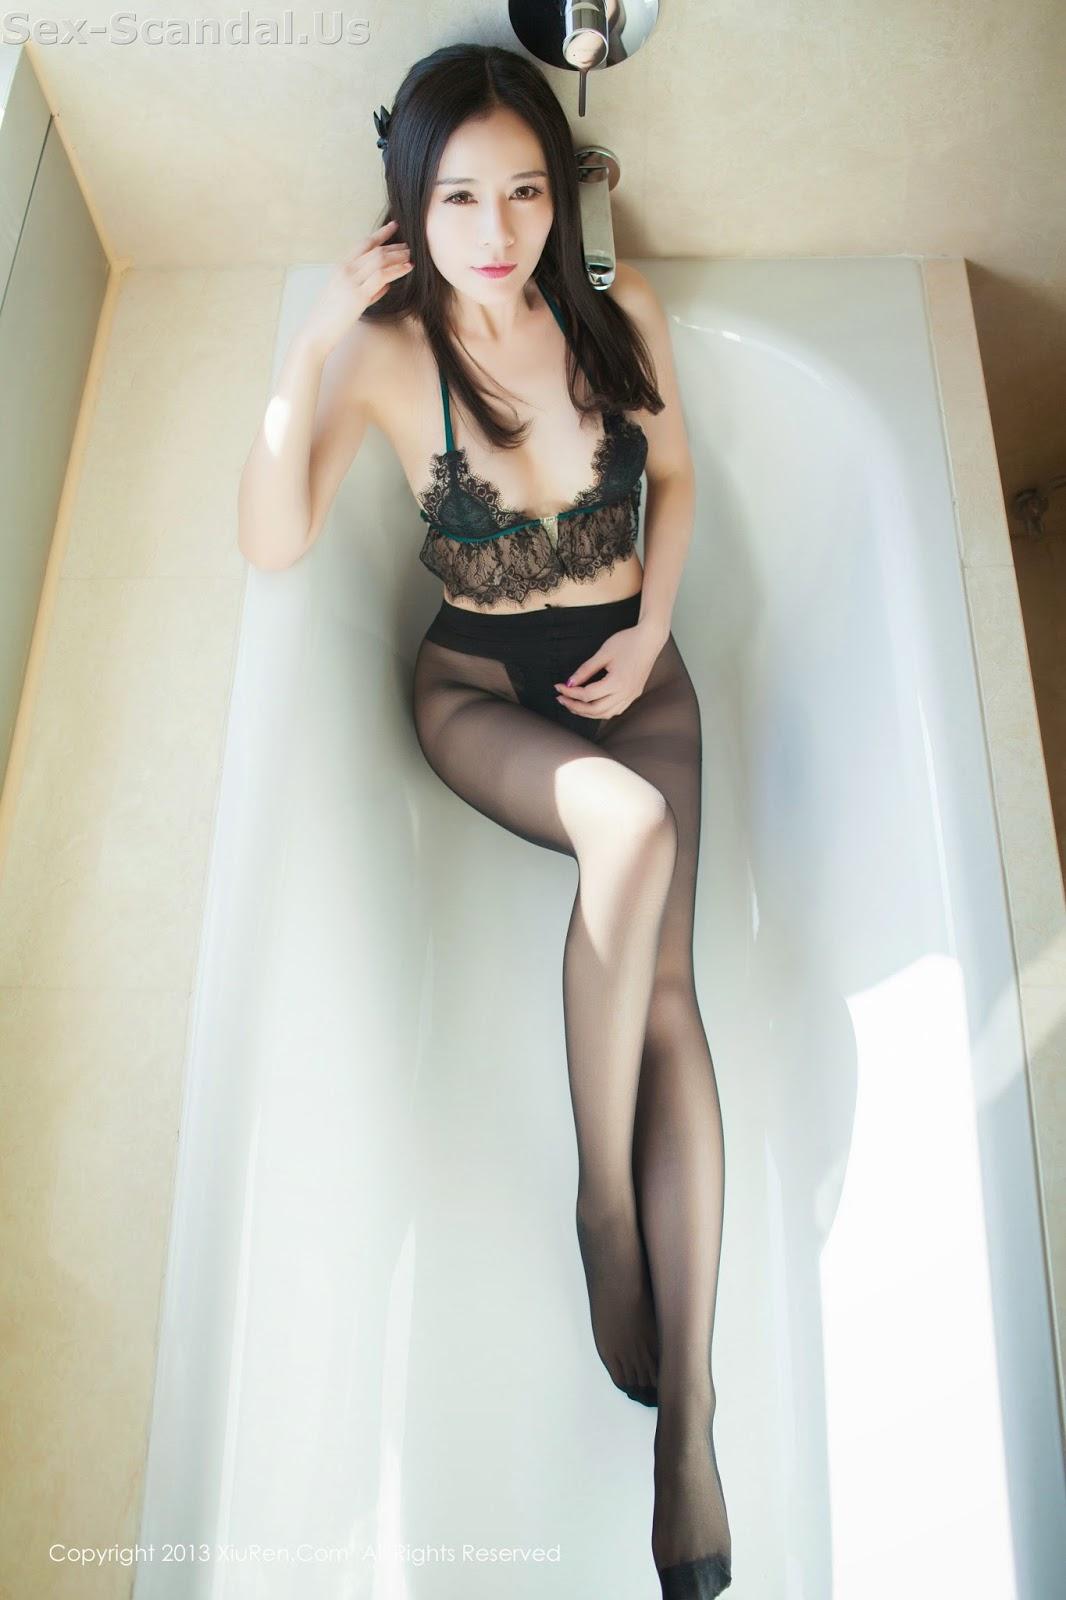 Mrs california nude pics interesting